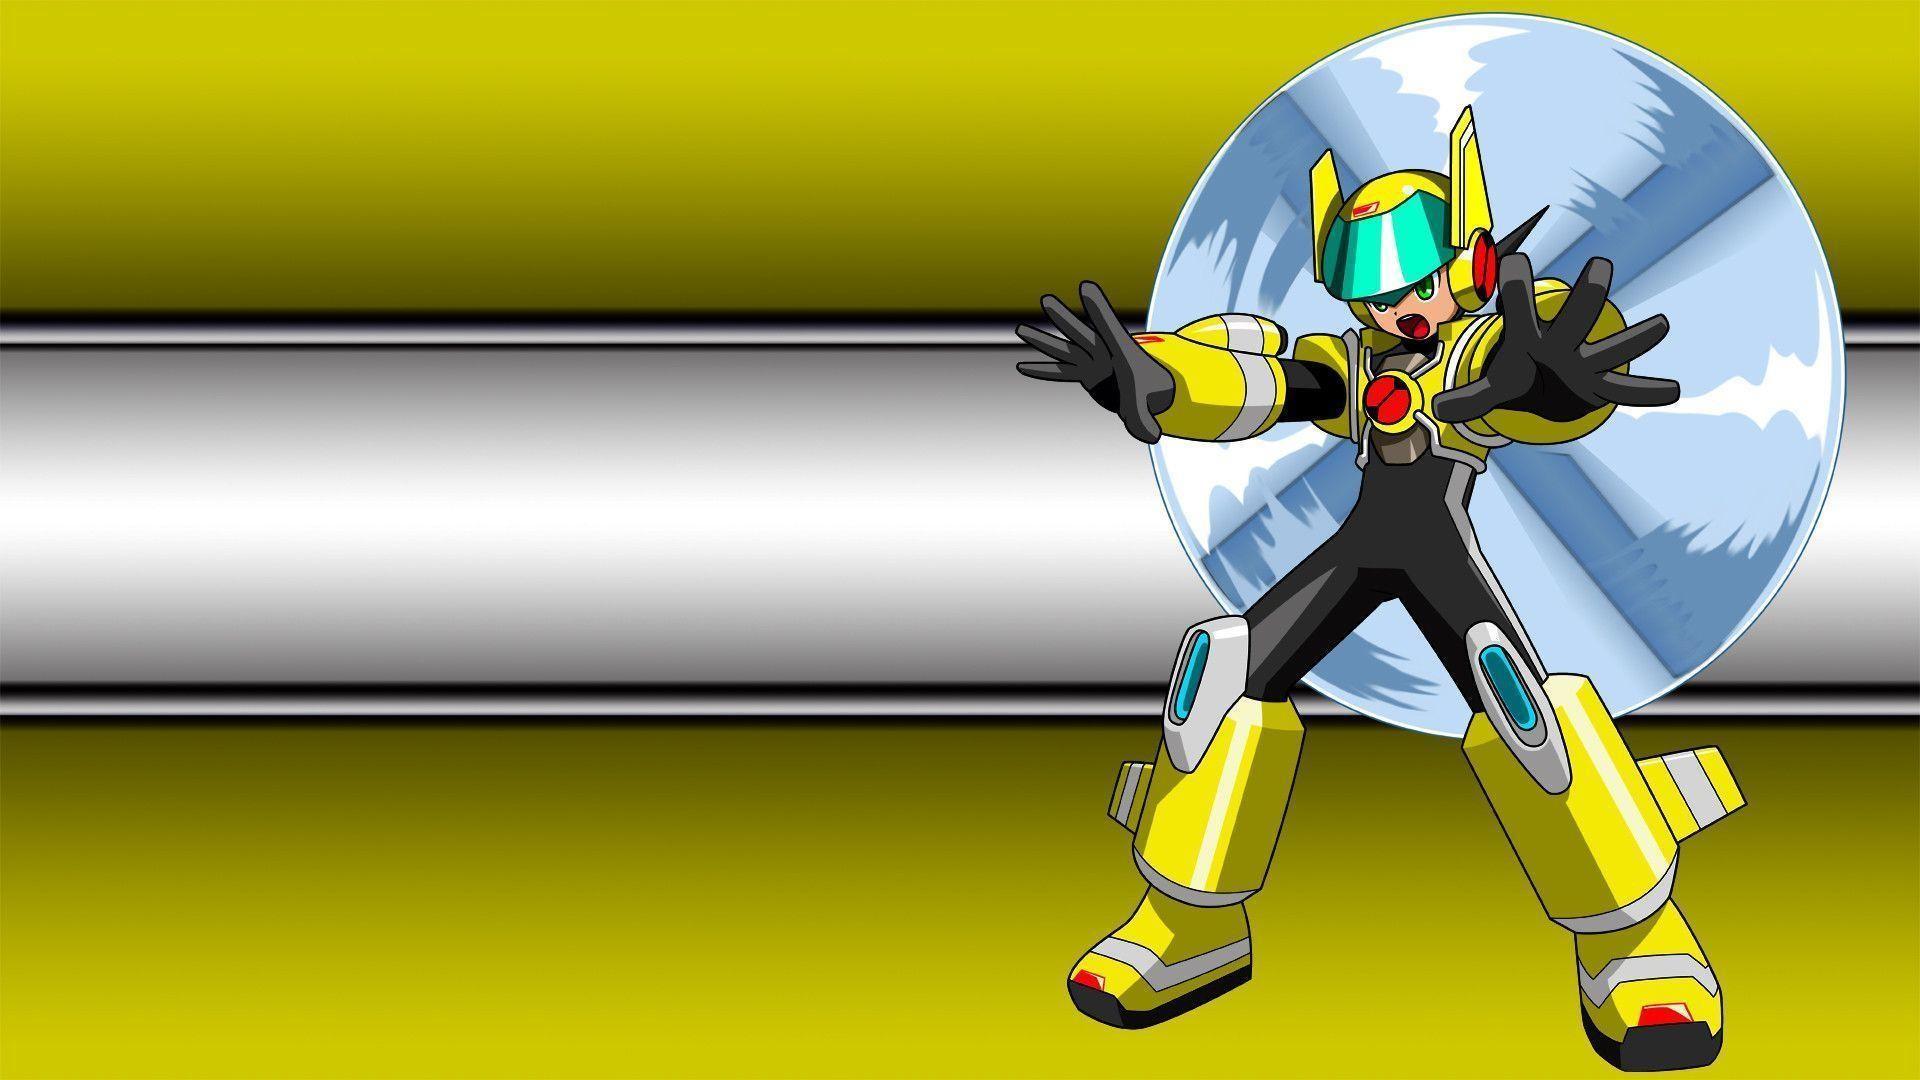 HD Battle Network – Mega Man In Air Suit Wallpaper | Download Free .